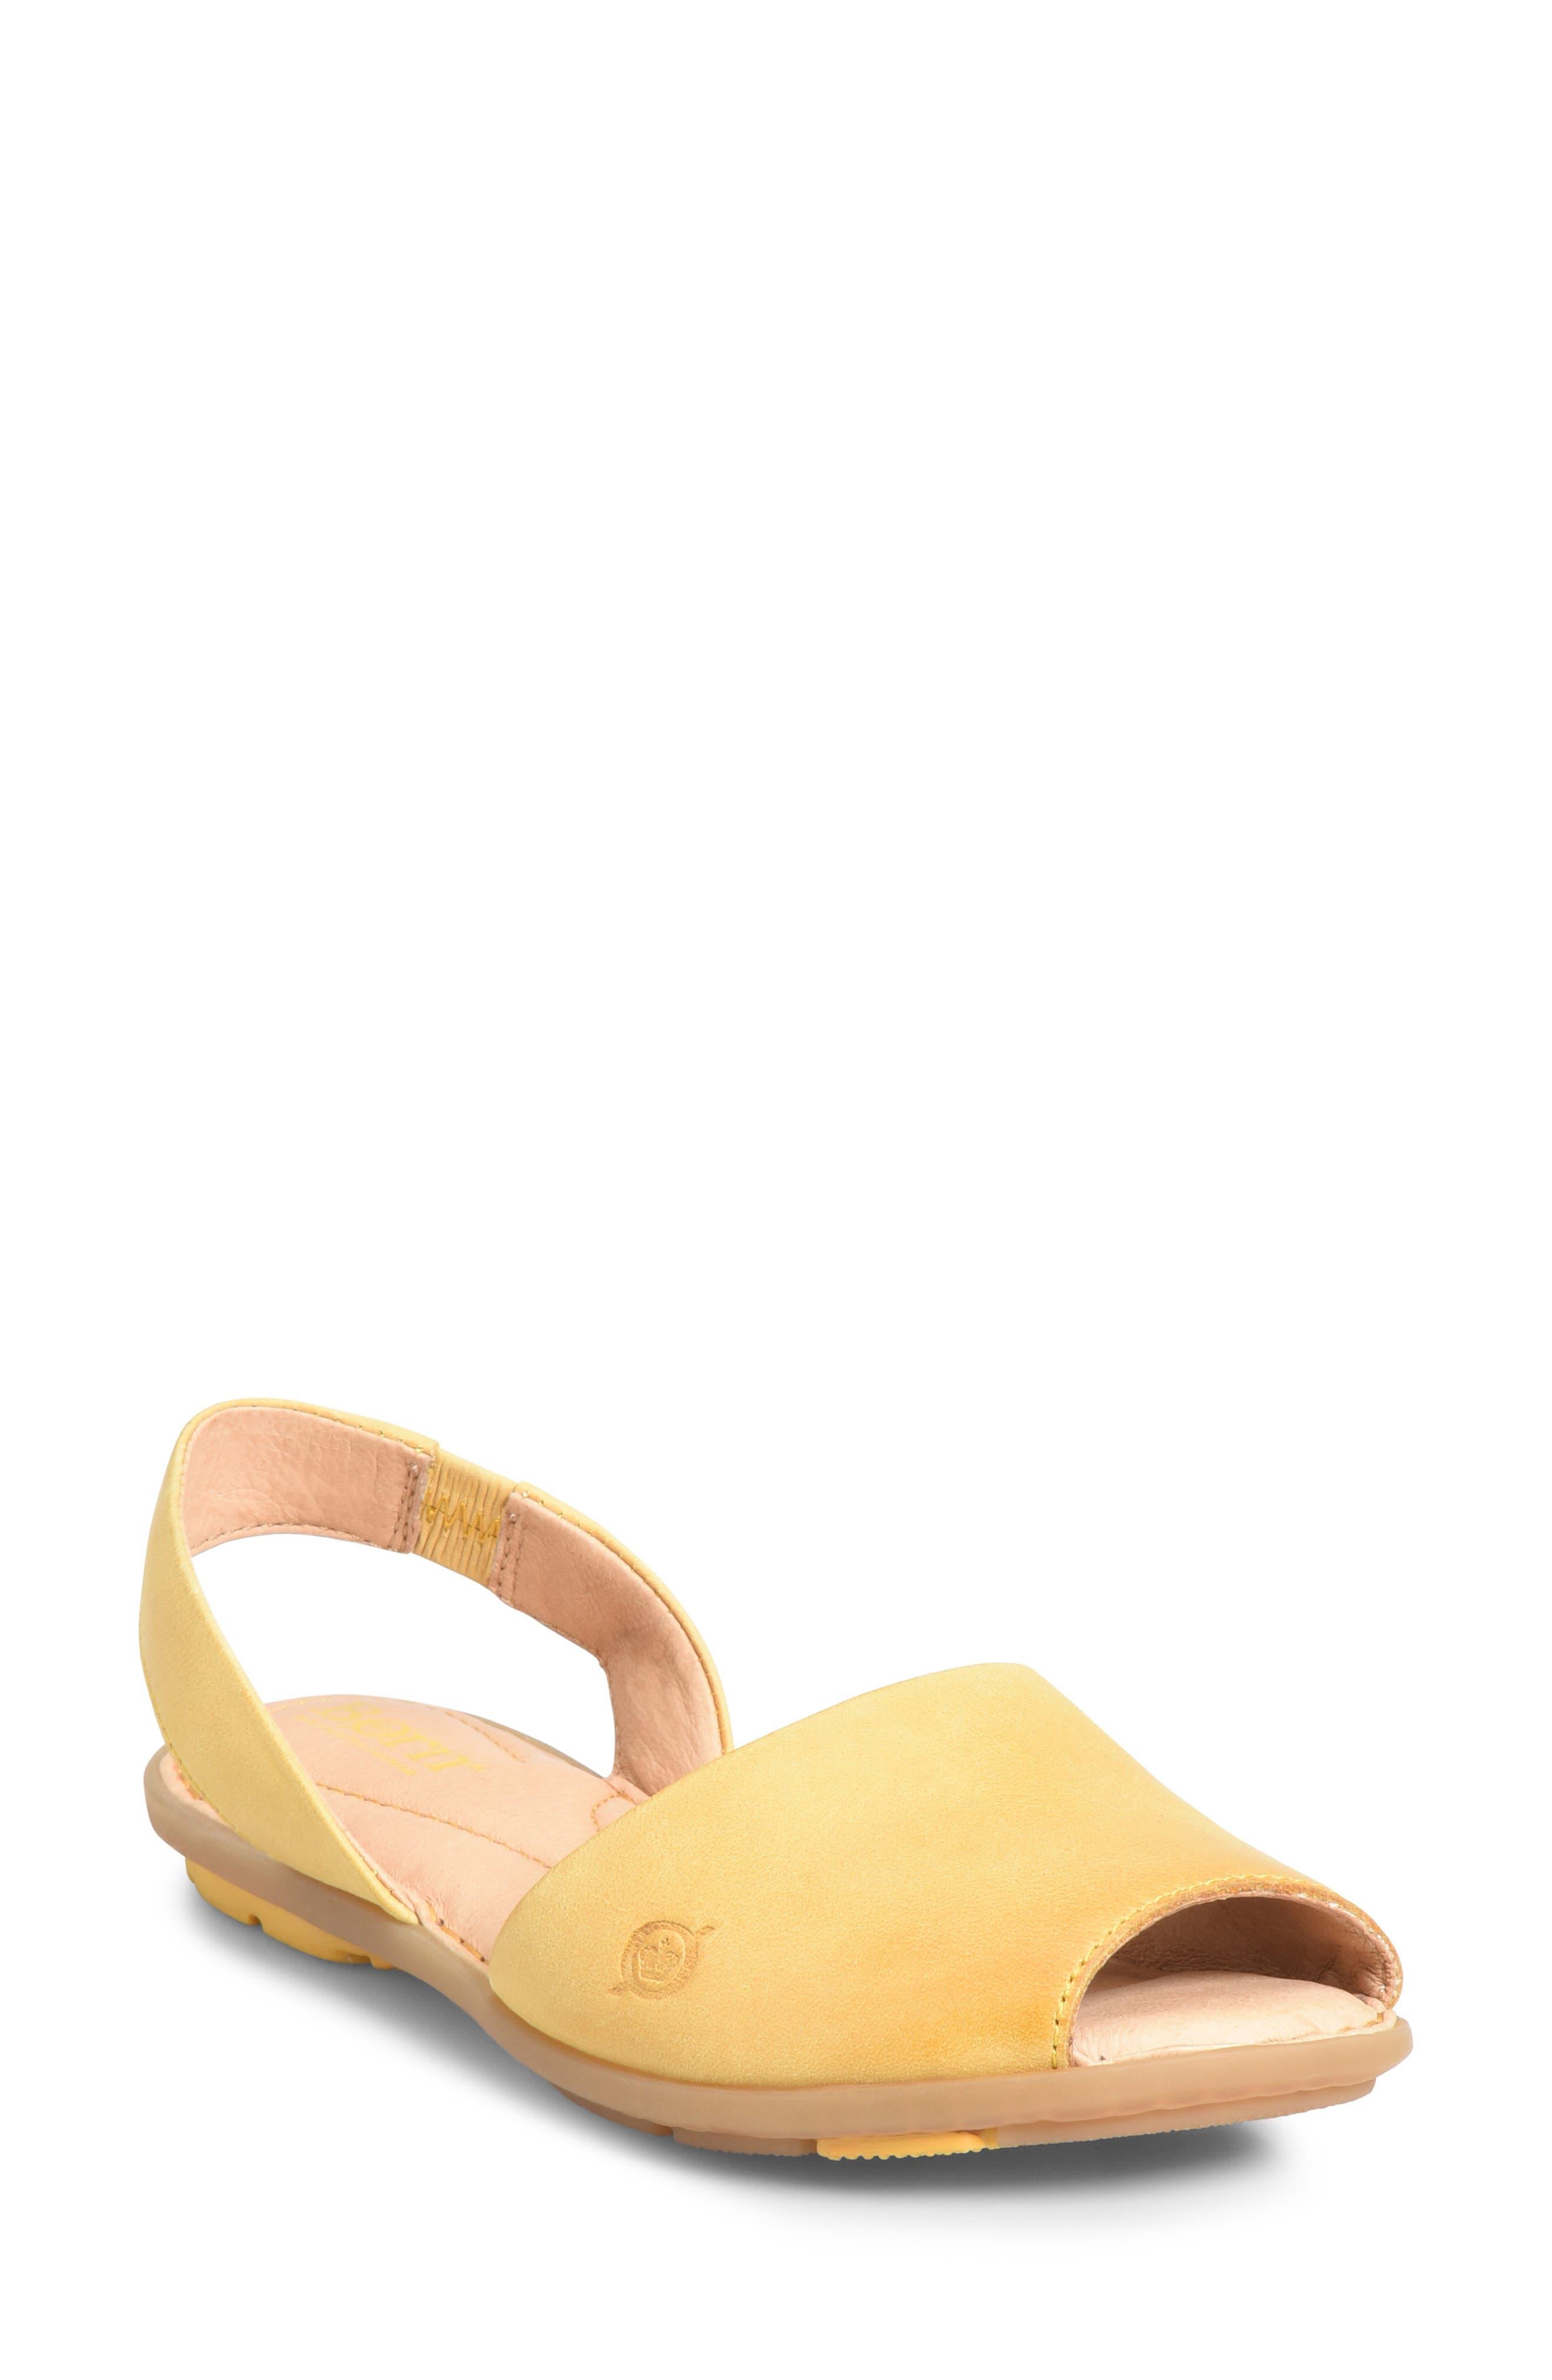 B?rn Trang Sandal, Yellow